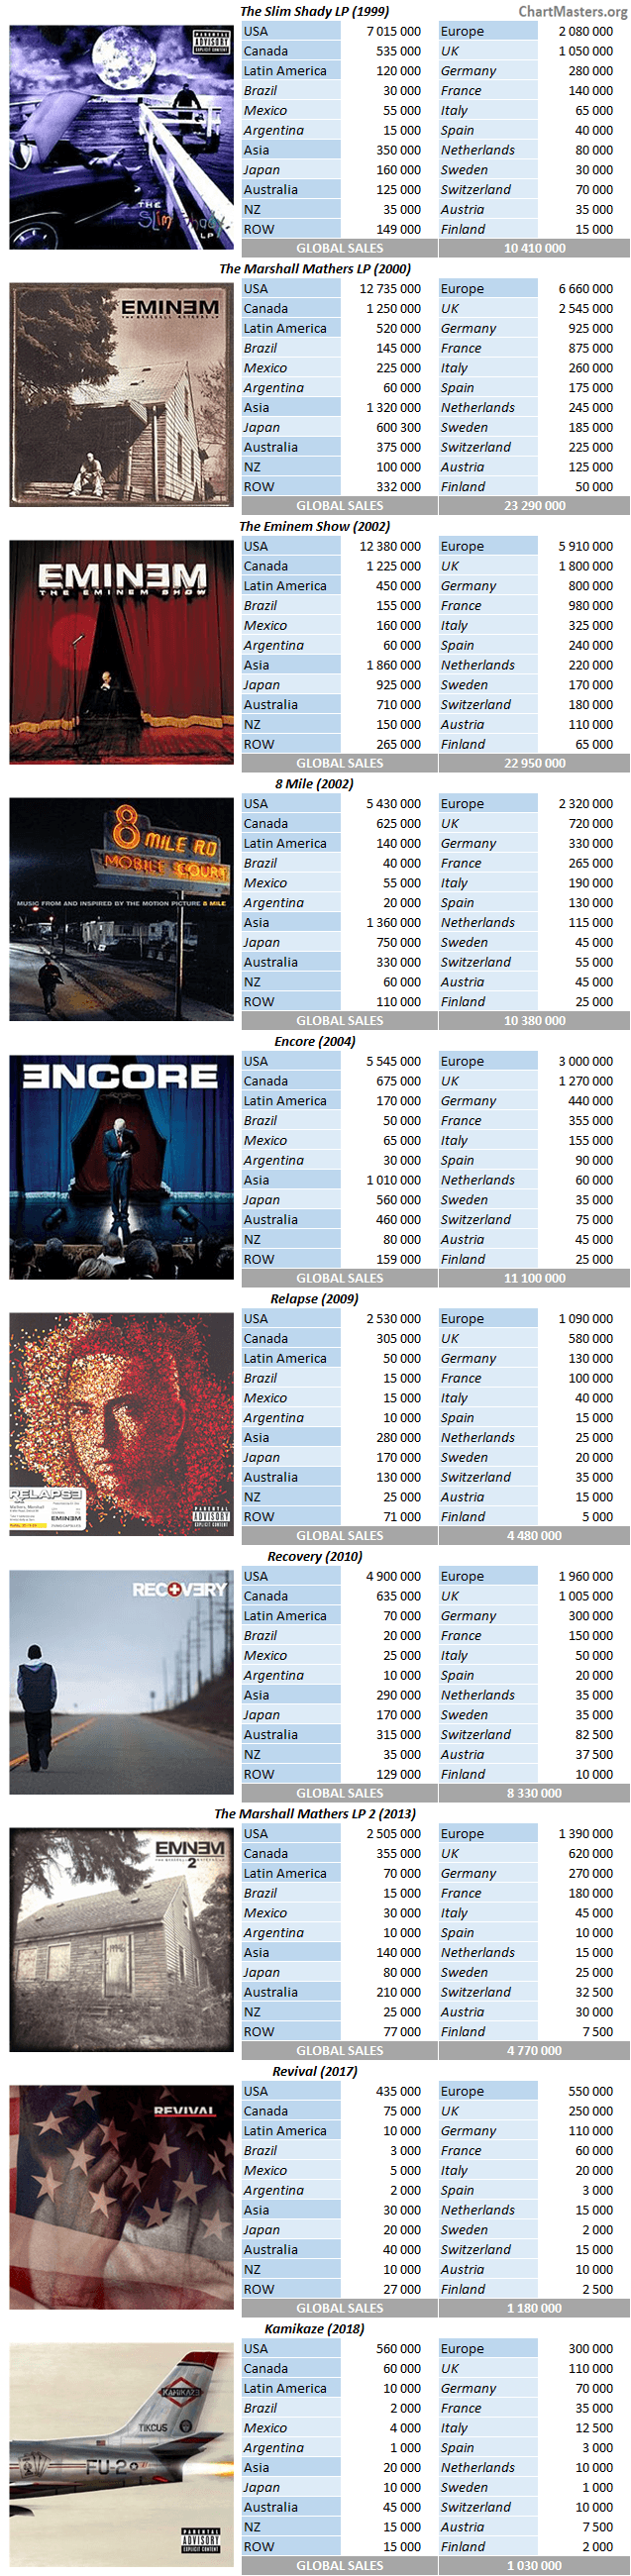 CSPC Eminem discography Album Sales Breakdown